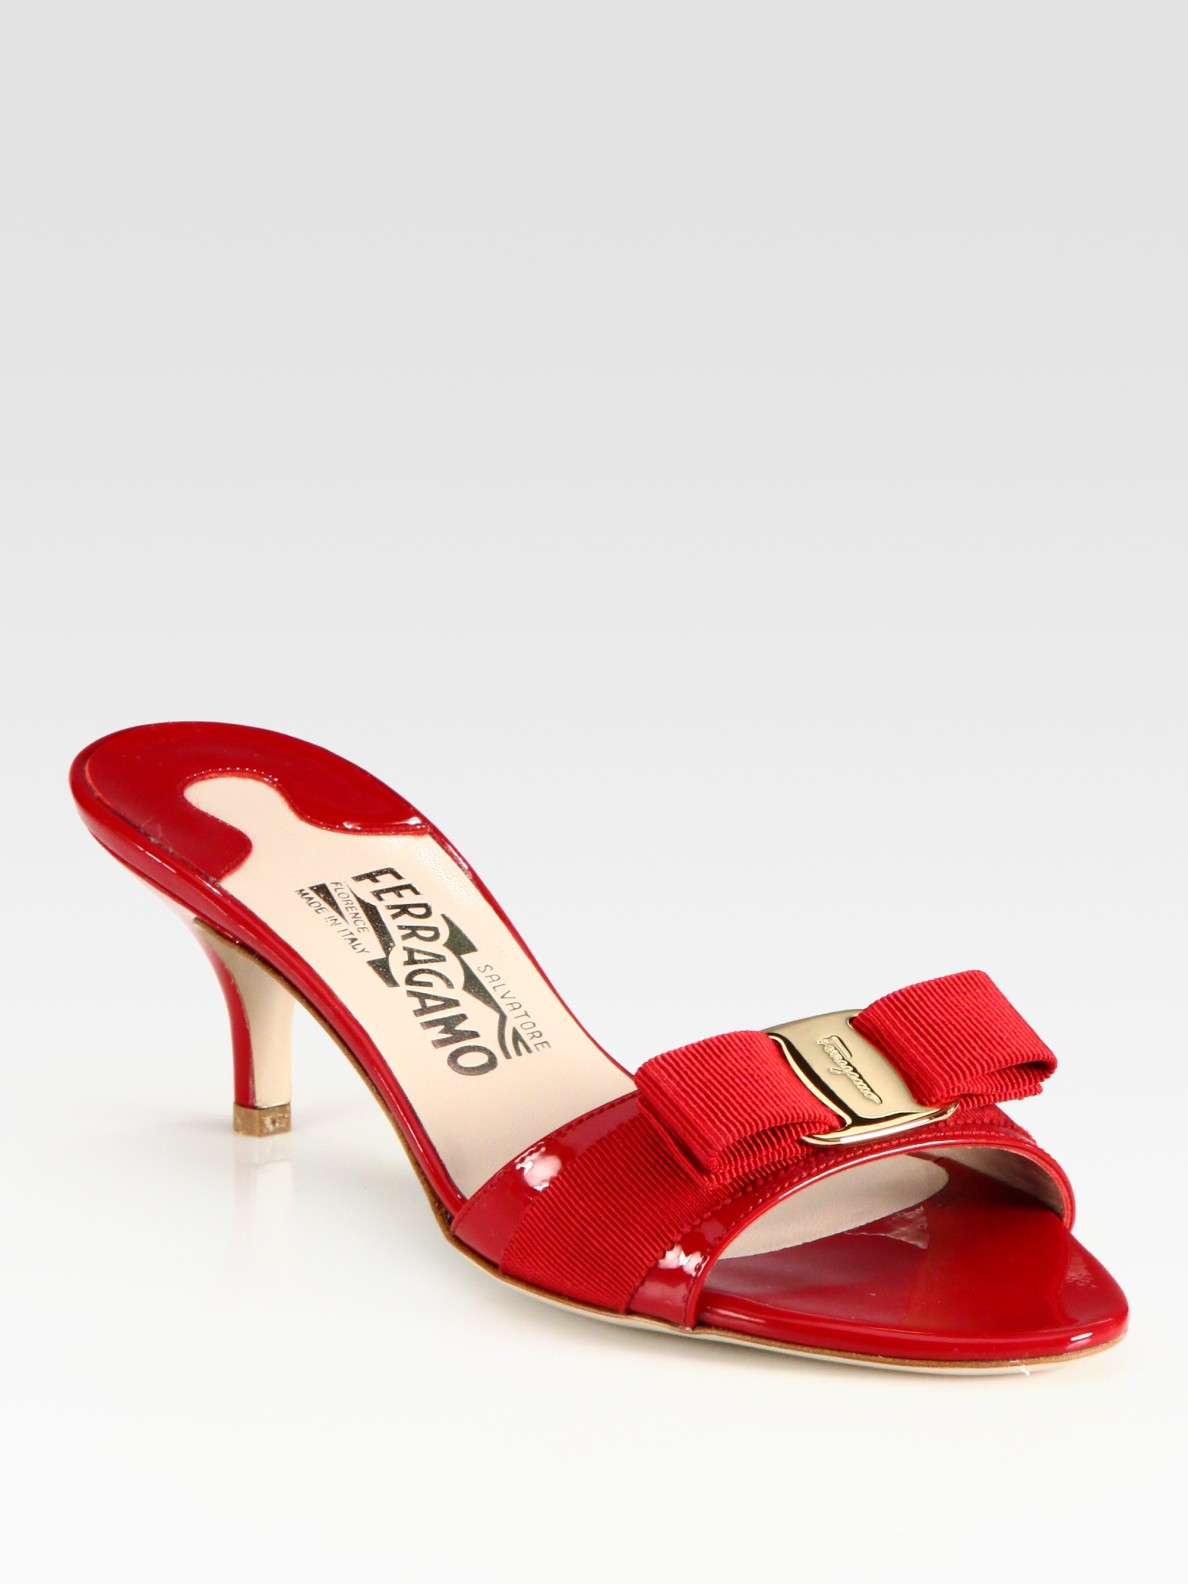 e109a36e2b7b Lyst - Ferragamo Vara Patent Leather Kittenheel Bow Pumps in Red